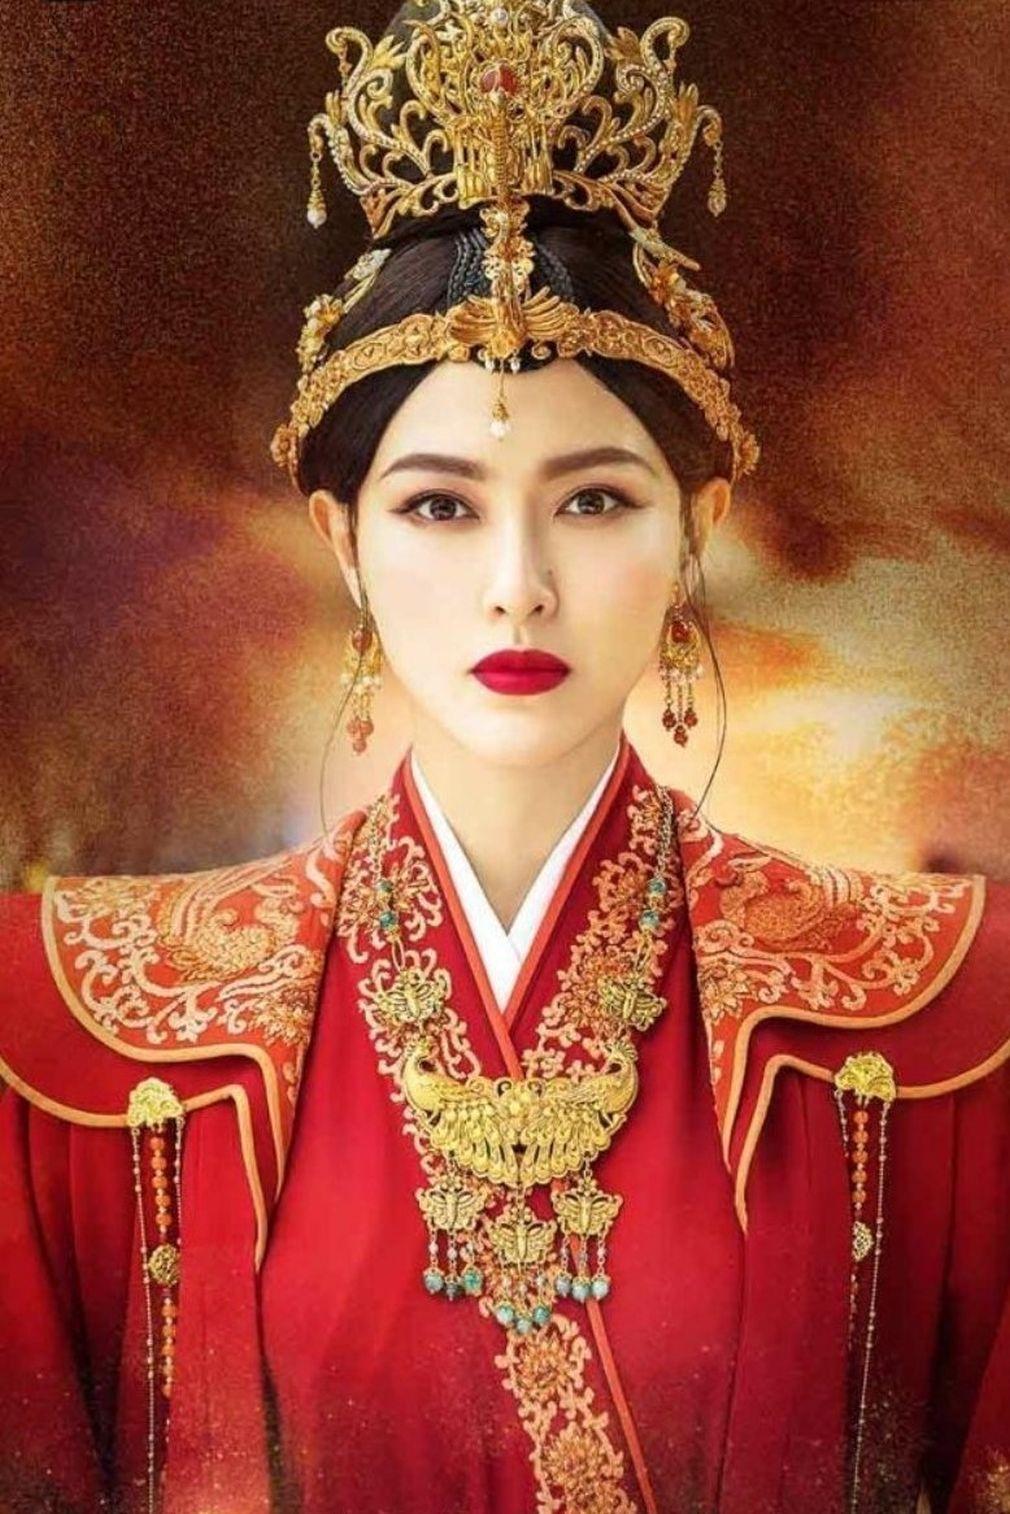 Legenda o Syao Cho - Дорама: Легенда о Сяо Чо